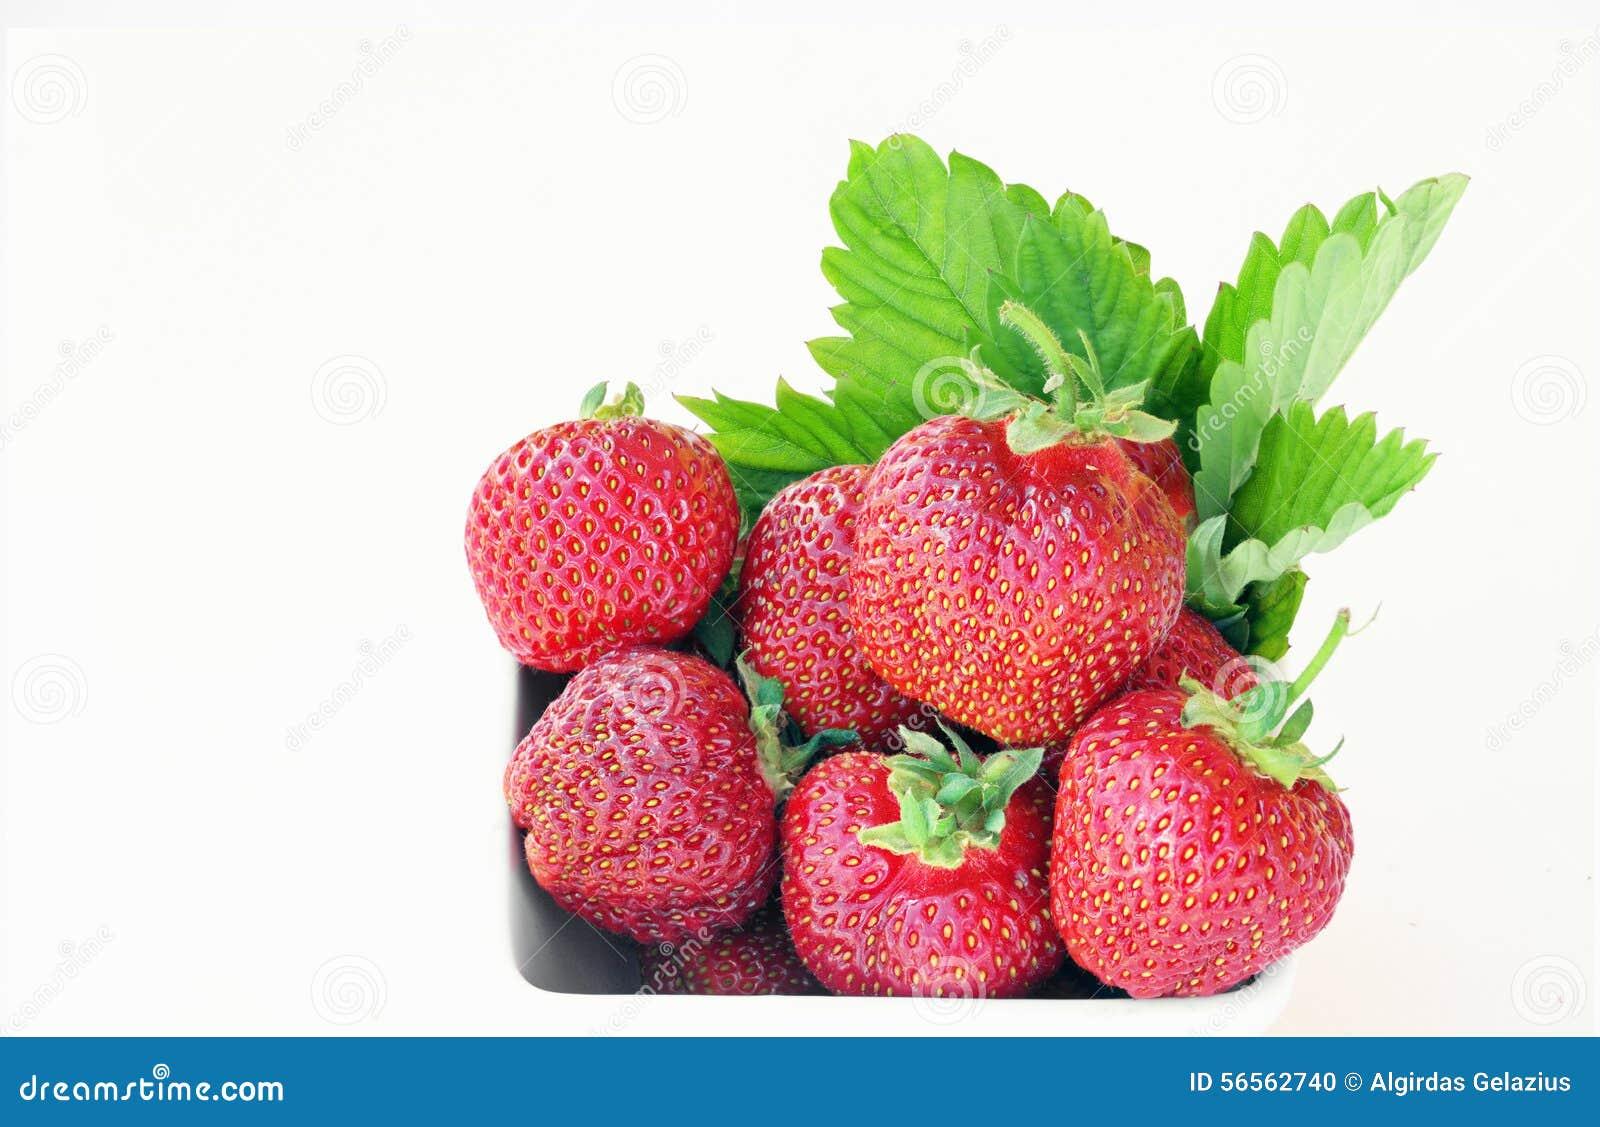 Download Ώριμες φράουλες σε ένα άσπρο κύπελλο Στοκ Εικόνες - εικόνα από φρέσκος, καρπός: 56562740